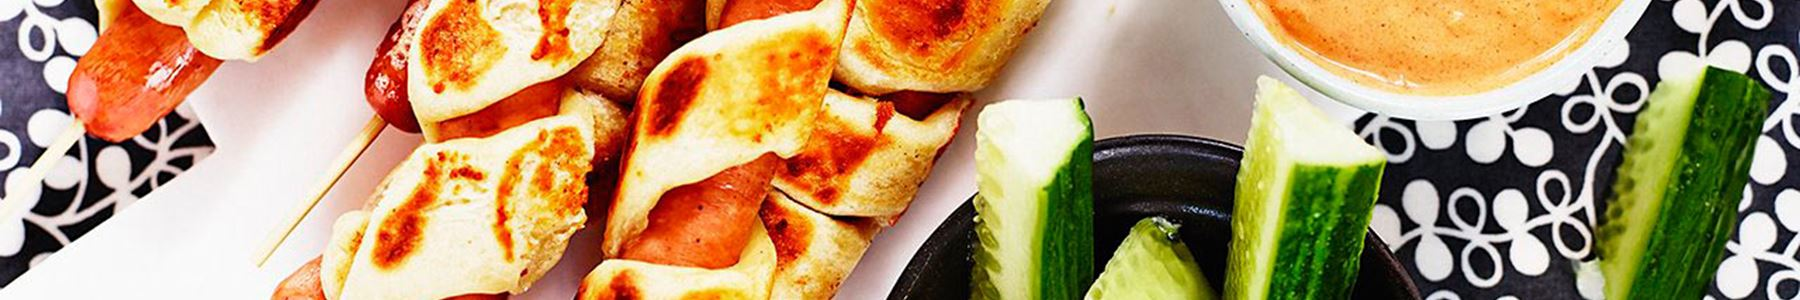 Brød og boller + Grøntsager + Mellemmåltid